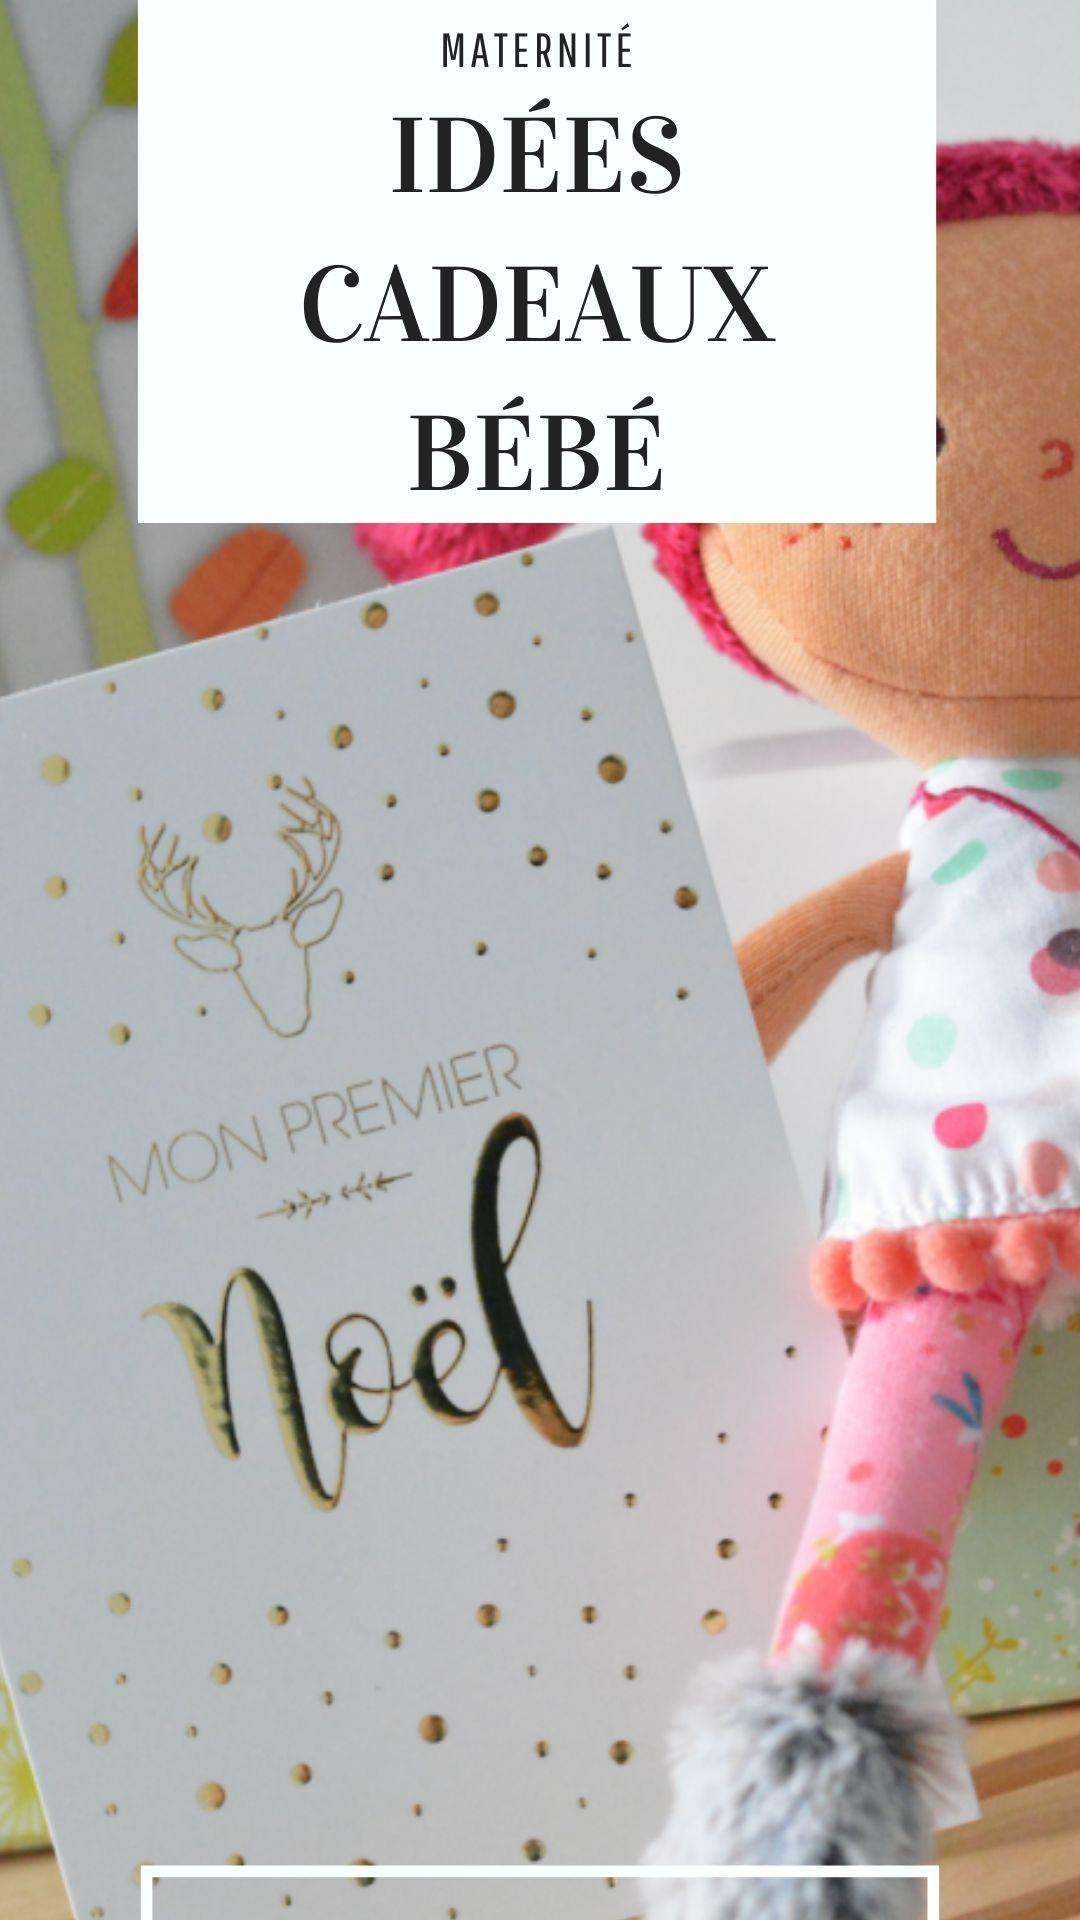 idees cadeaux bebe